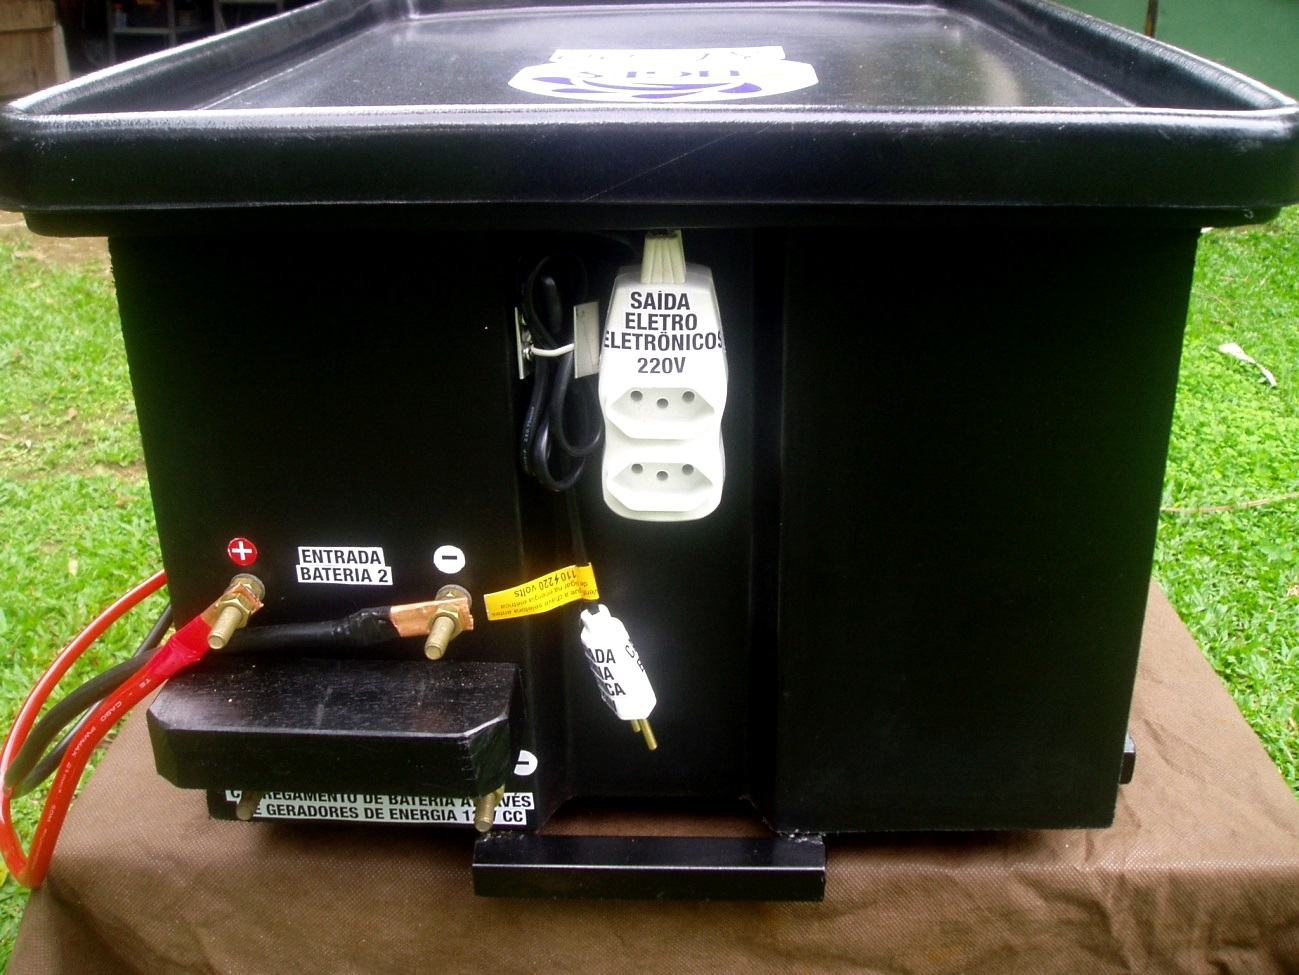 de Energia Sustentável Caixa d'água vira miniusina de energia #709C2F 1299x975